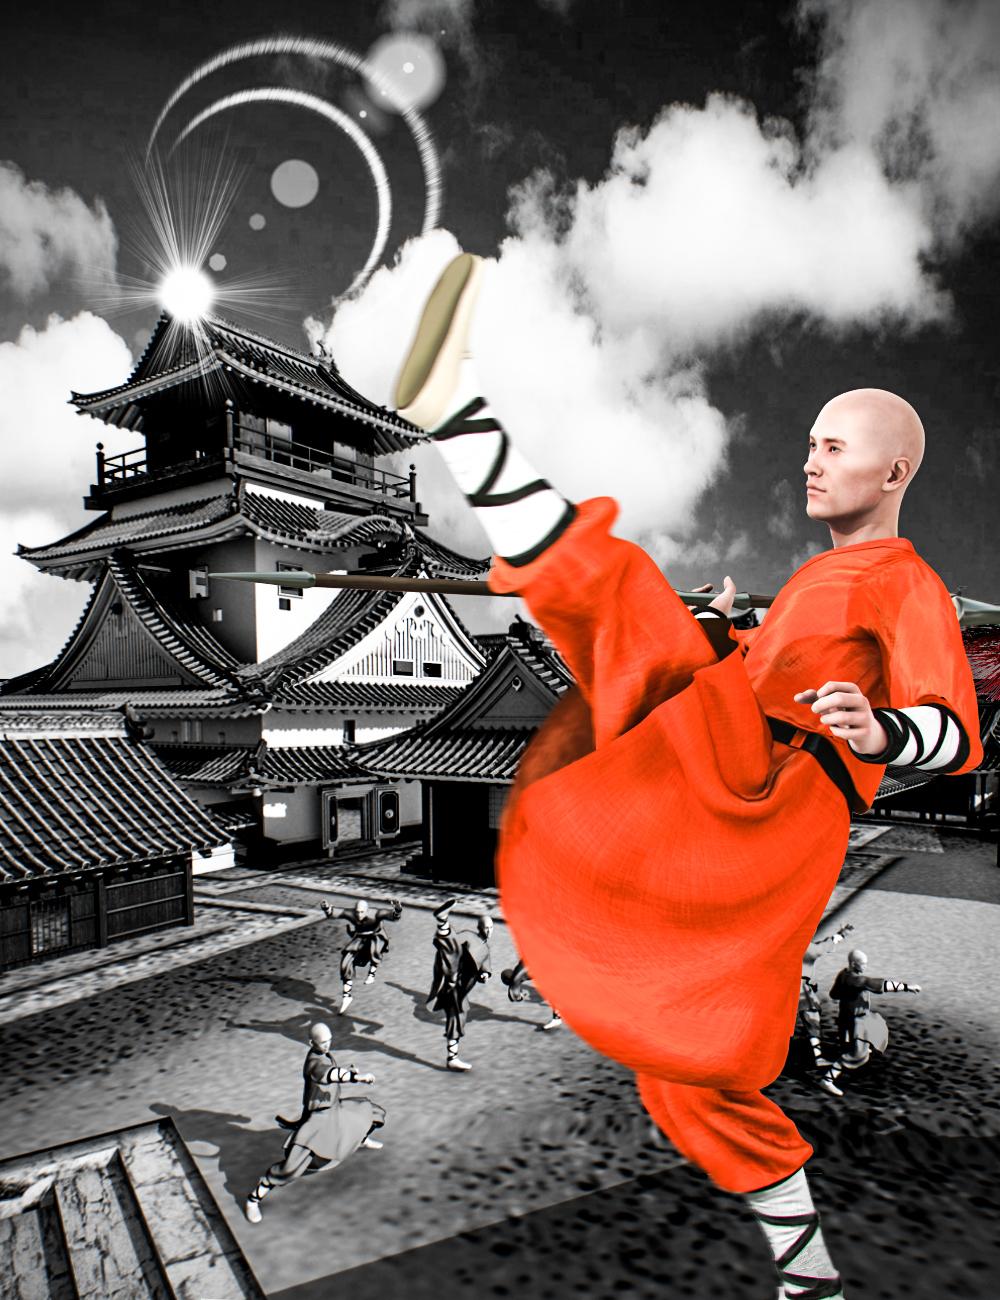 Mec4D Shaolin Monk Uniform for Genesis 2 Male(s) by: Mec4D, 3D Models by Daz 3D